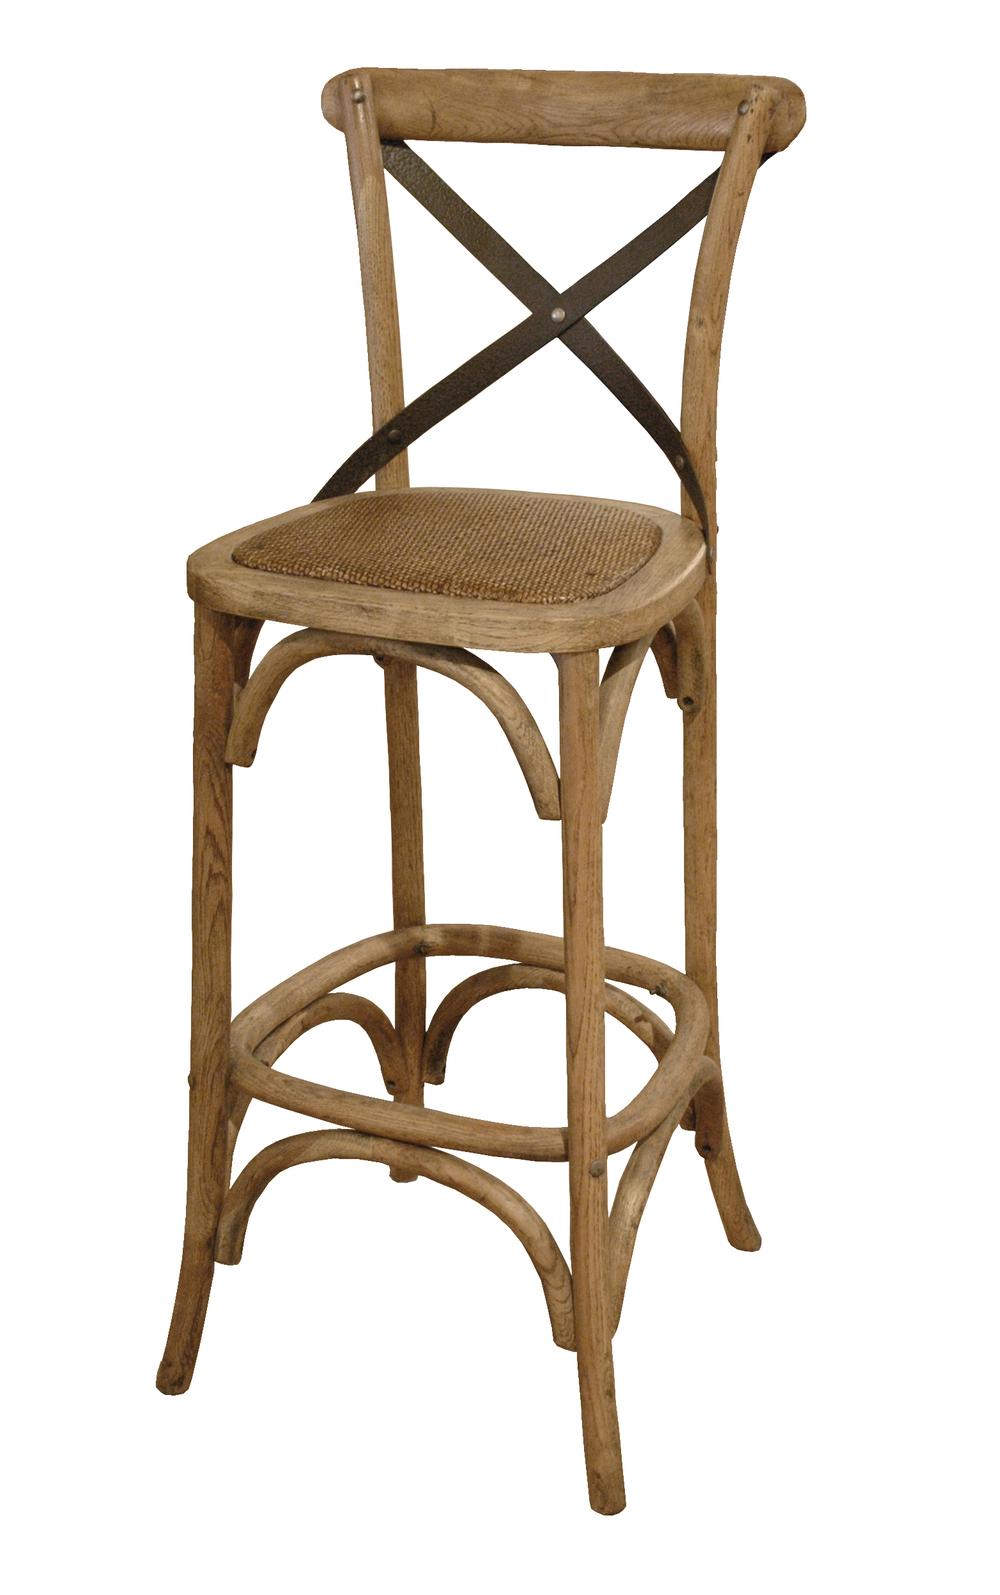 GJ Styles - Bar Chair with Metal Cross